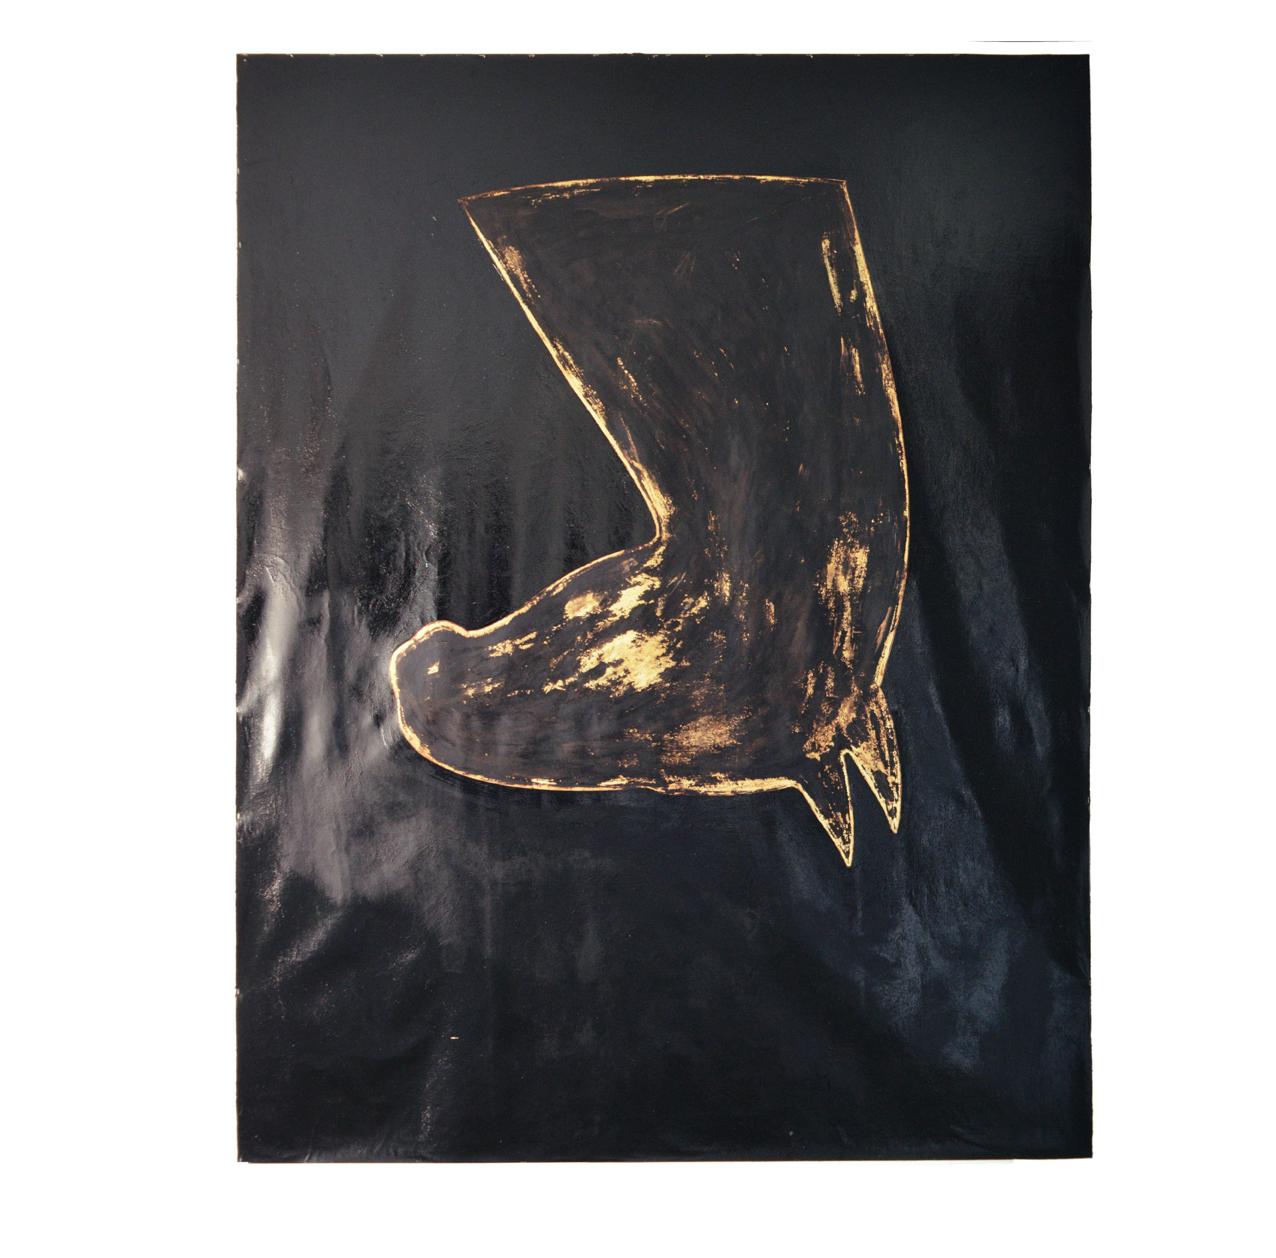 """Pferdebild gold-schwarz"" 1981, Teer, Öl, Goldbronze auf Leinwand, 275 x 210 cm - Sammlung Don & Nancy Eiler, Madison, Wisconsin - Foto Stephan Hadler"